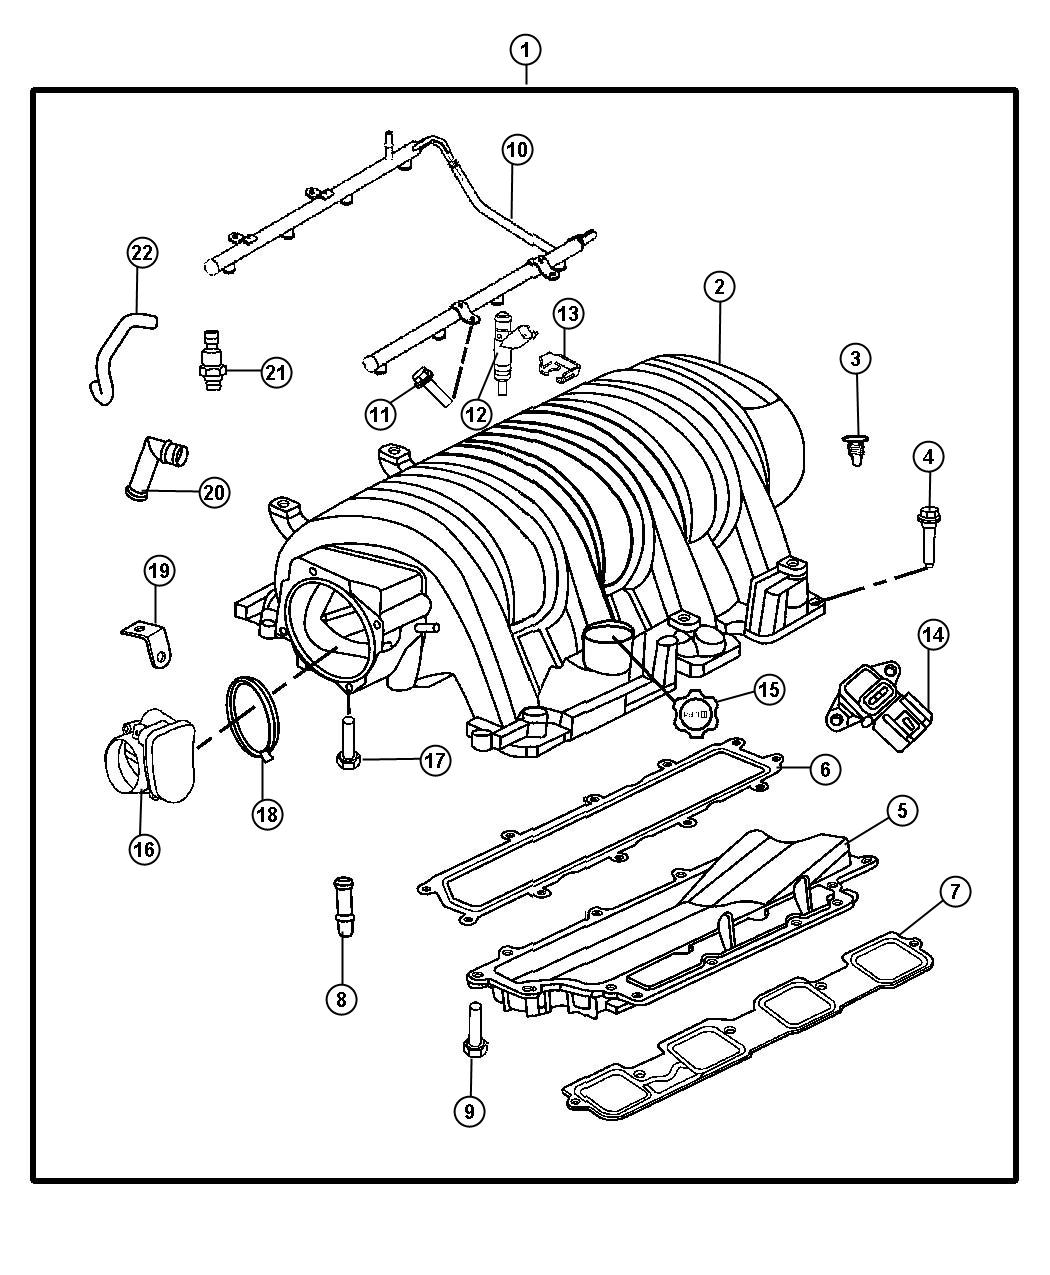 2008 Dodge Charger Valve. Pcv. Engine, hemi, smpi